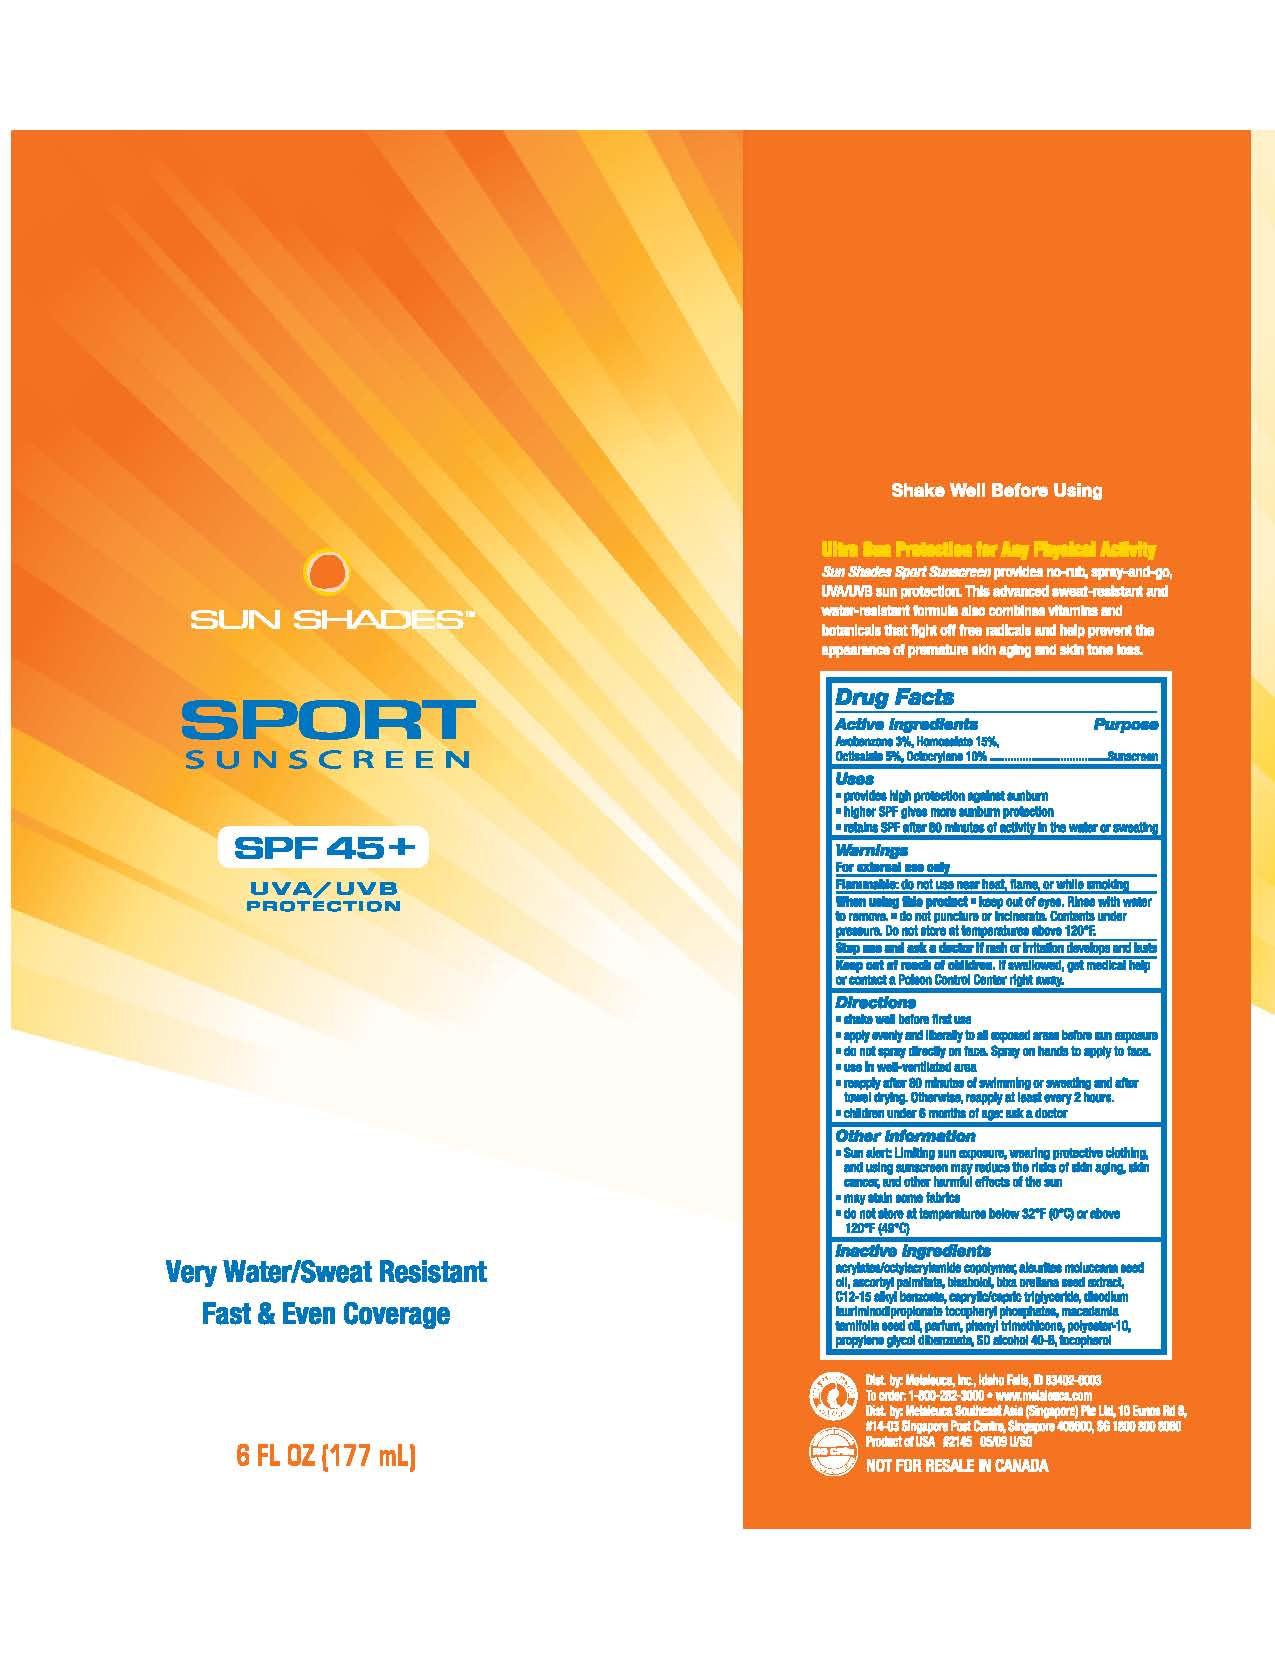 Sun Shades Sport Plus (Avobenzone, Homosalate, Octisalate, Octocrylene) Spray [Melaleuca, Inc.]